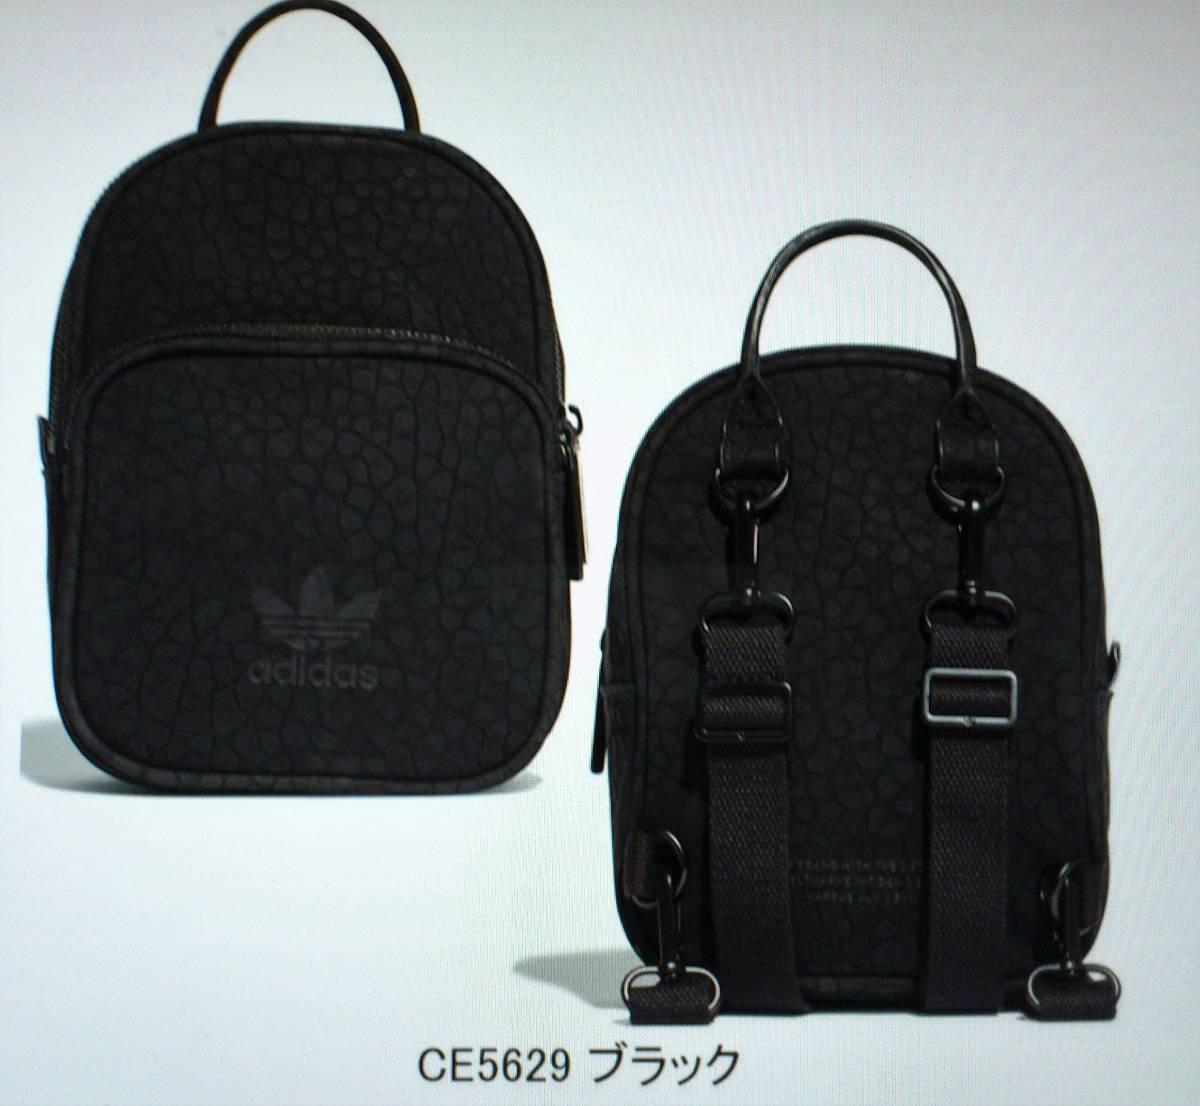 7a8e9724bbc 正規・adidas Originals・AC BACKPACK CLASSIC MINI・バックパック・ミニ ...